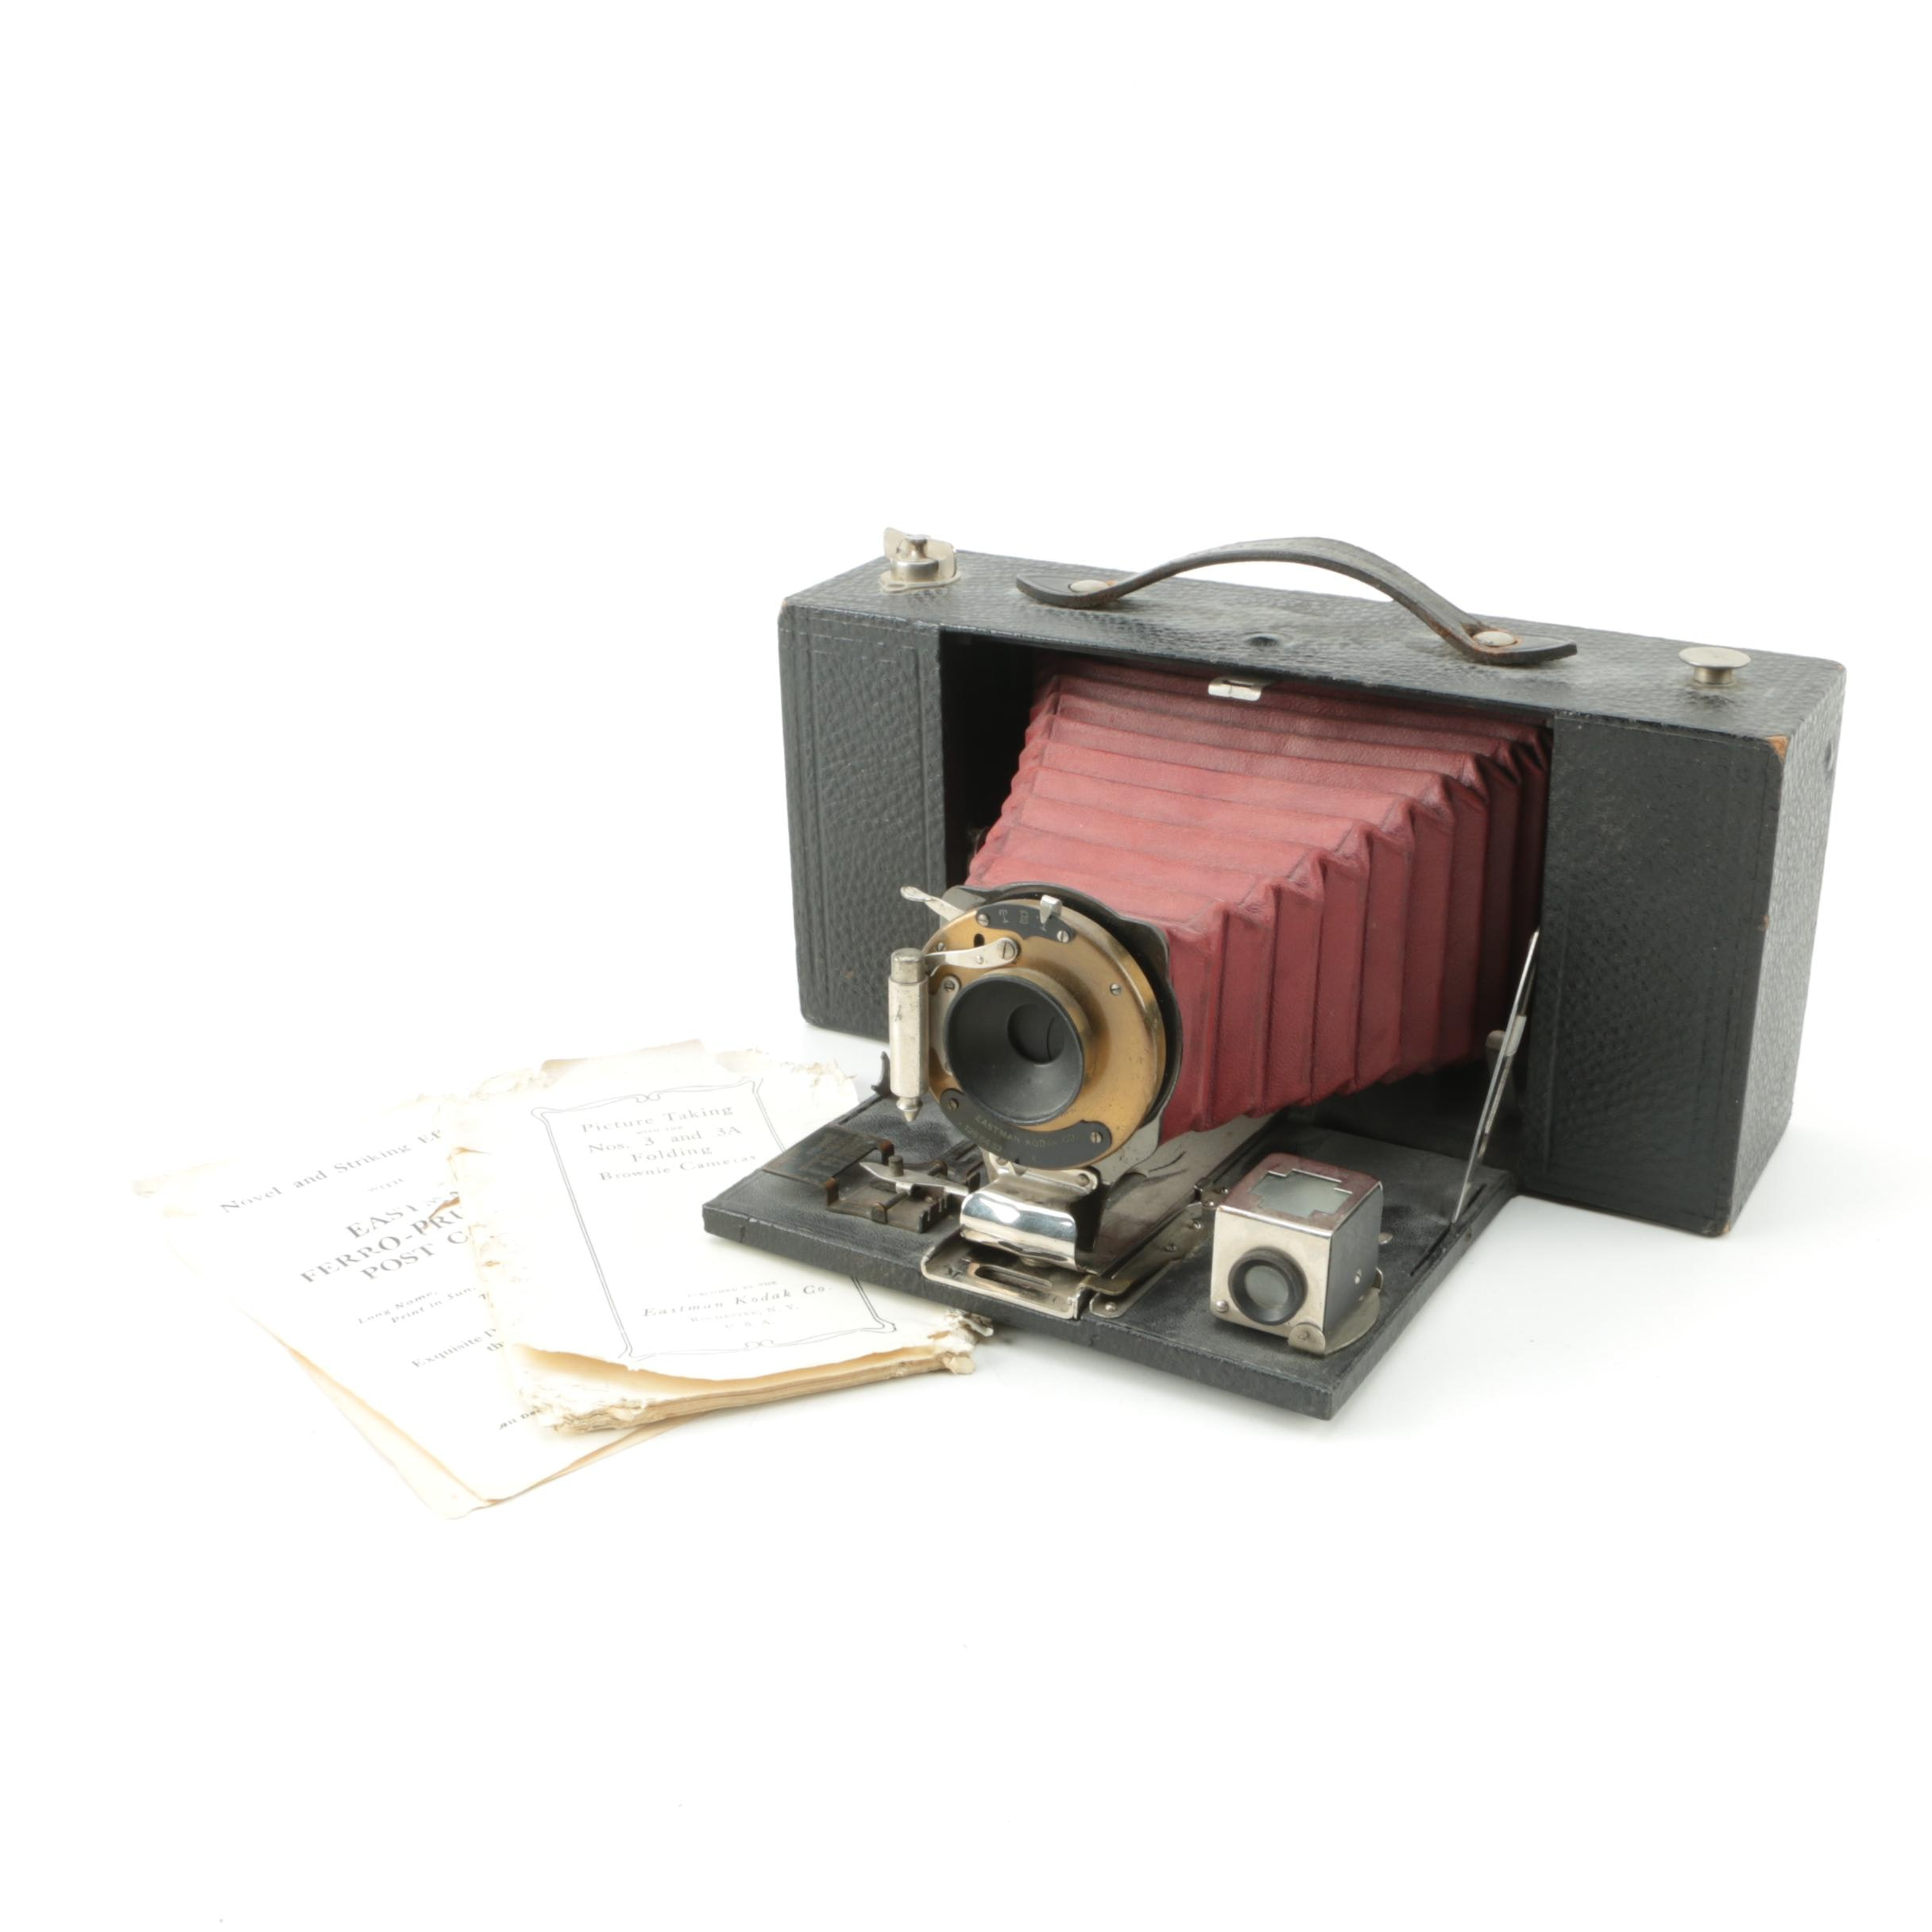 Vintage Eastman Kodak NO. 3-A Folding Brownie Still Camera